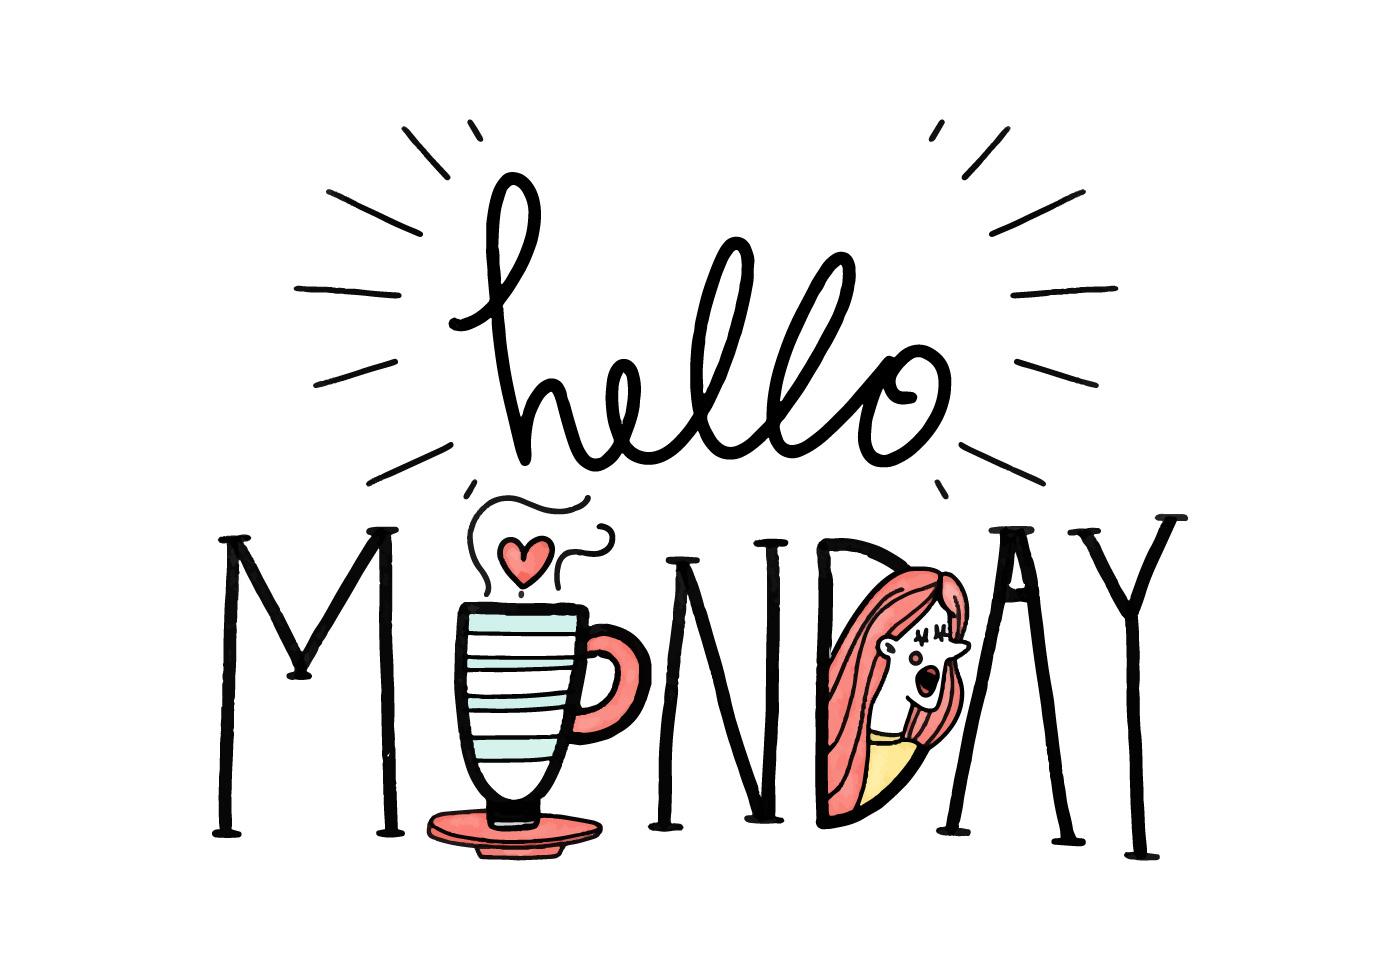 Happy Monday Morning Greetings